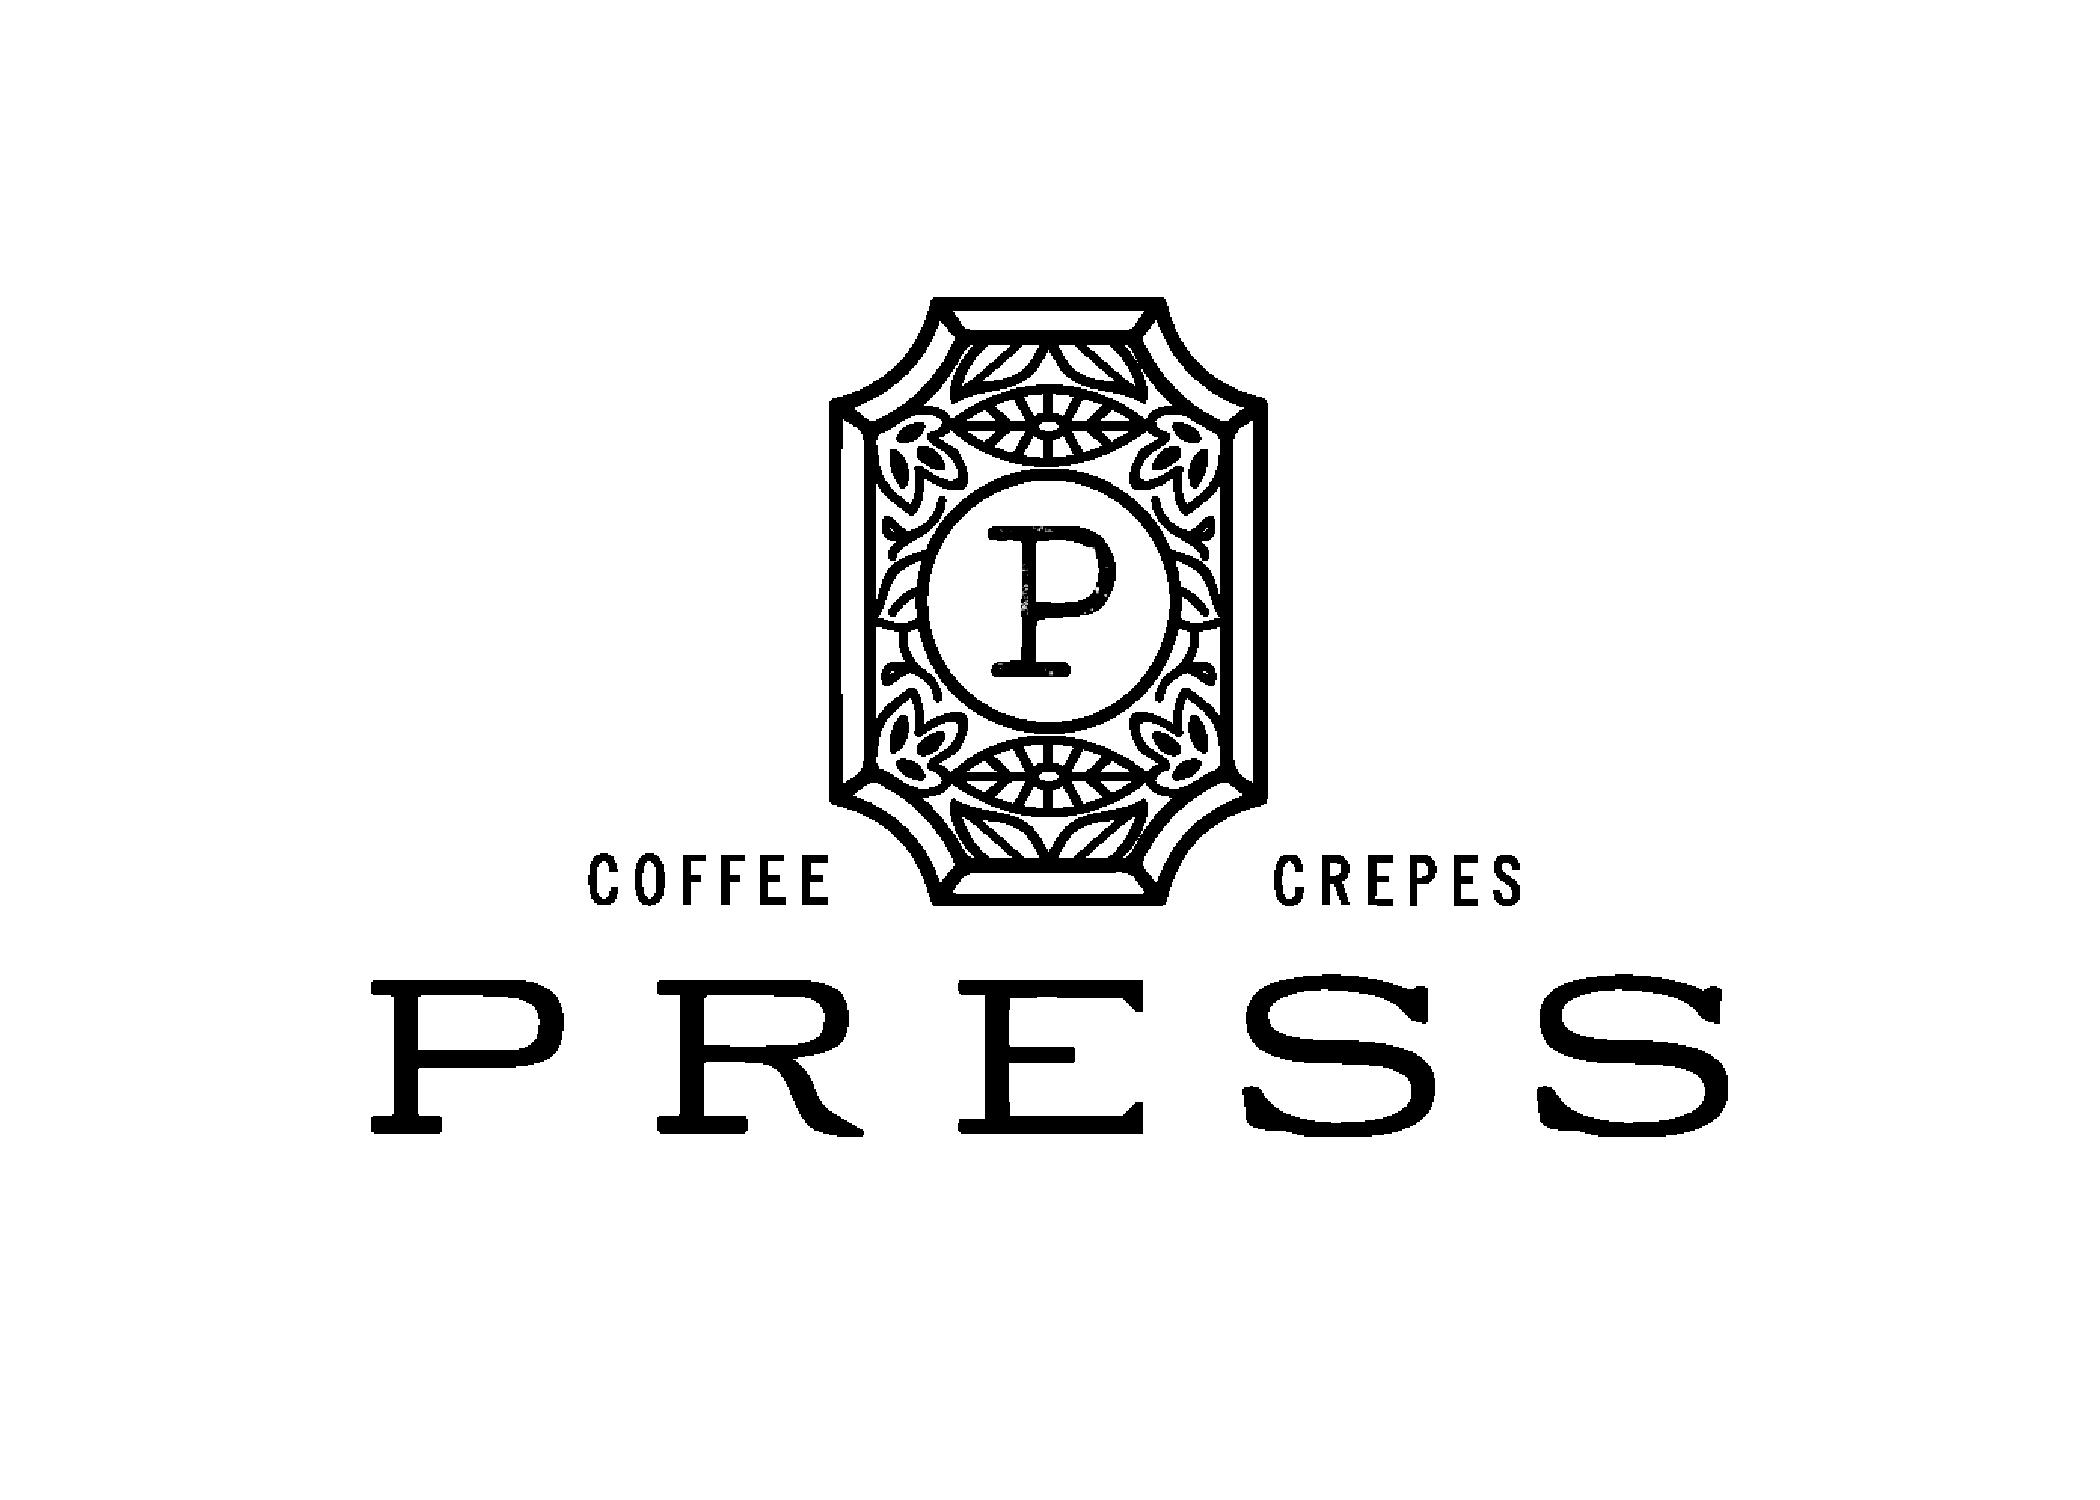 Design by Good South / Press Logo Design